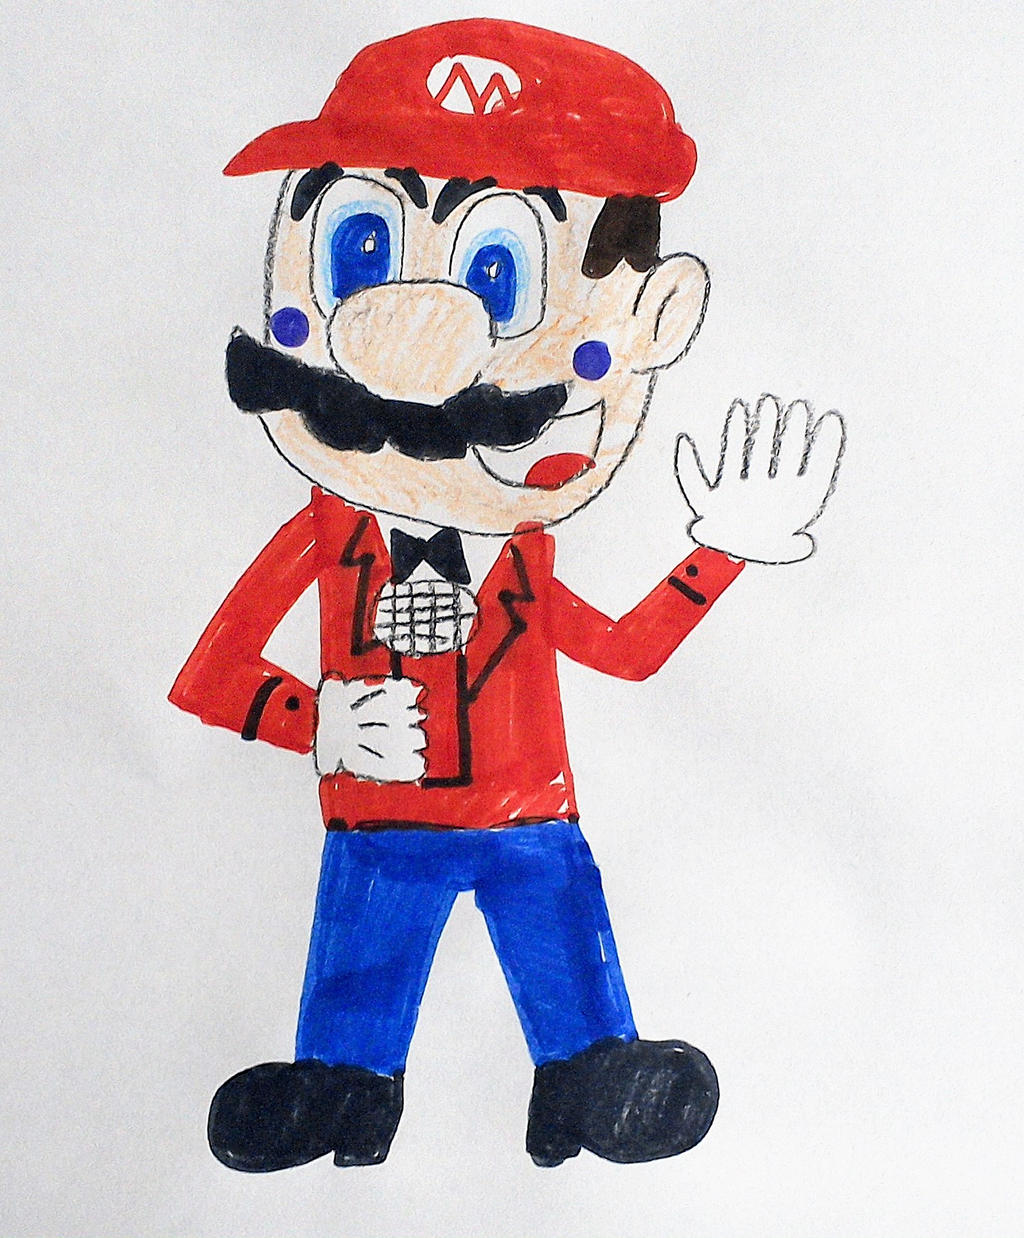 Funtime Mario by SuperSmash6453